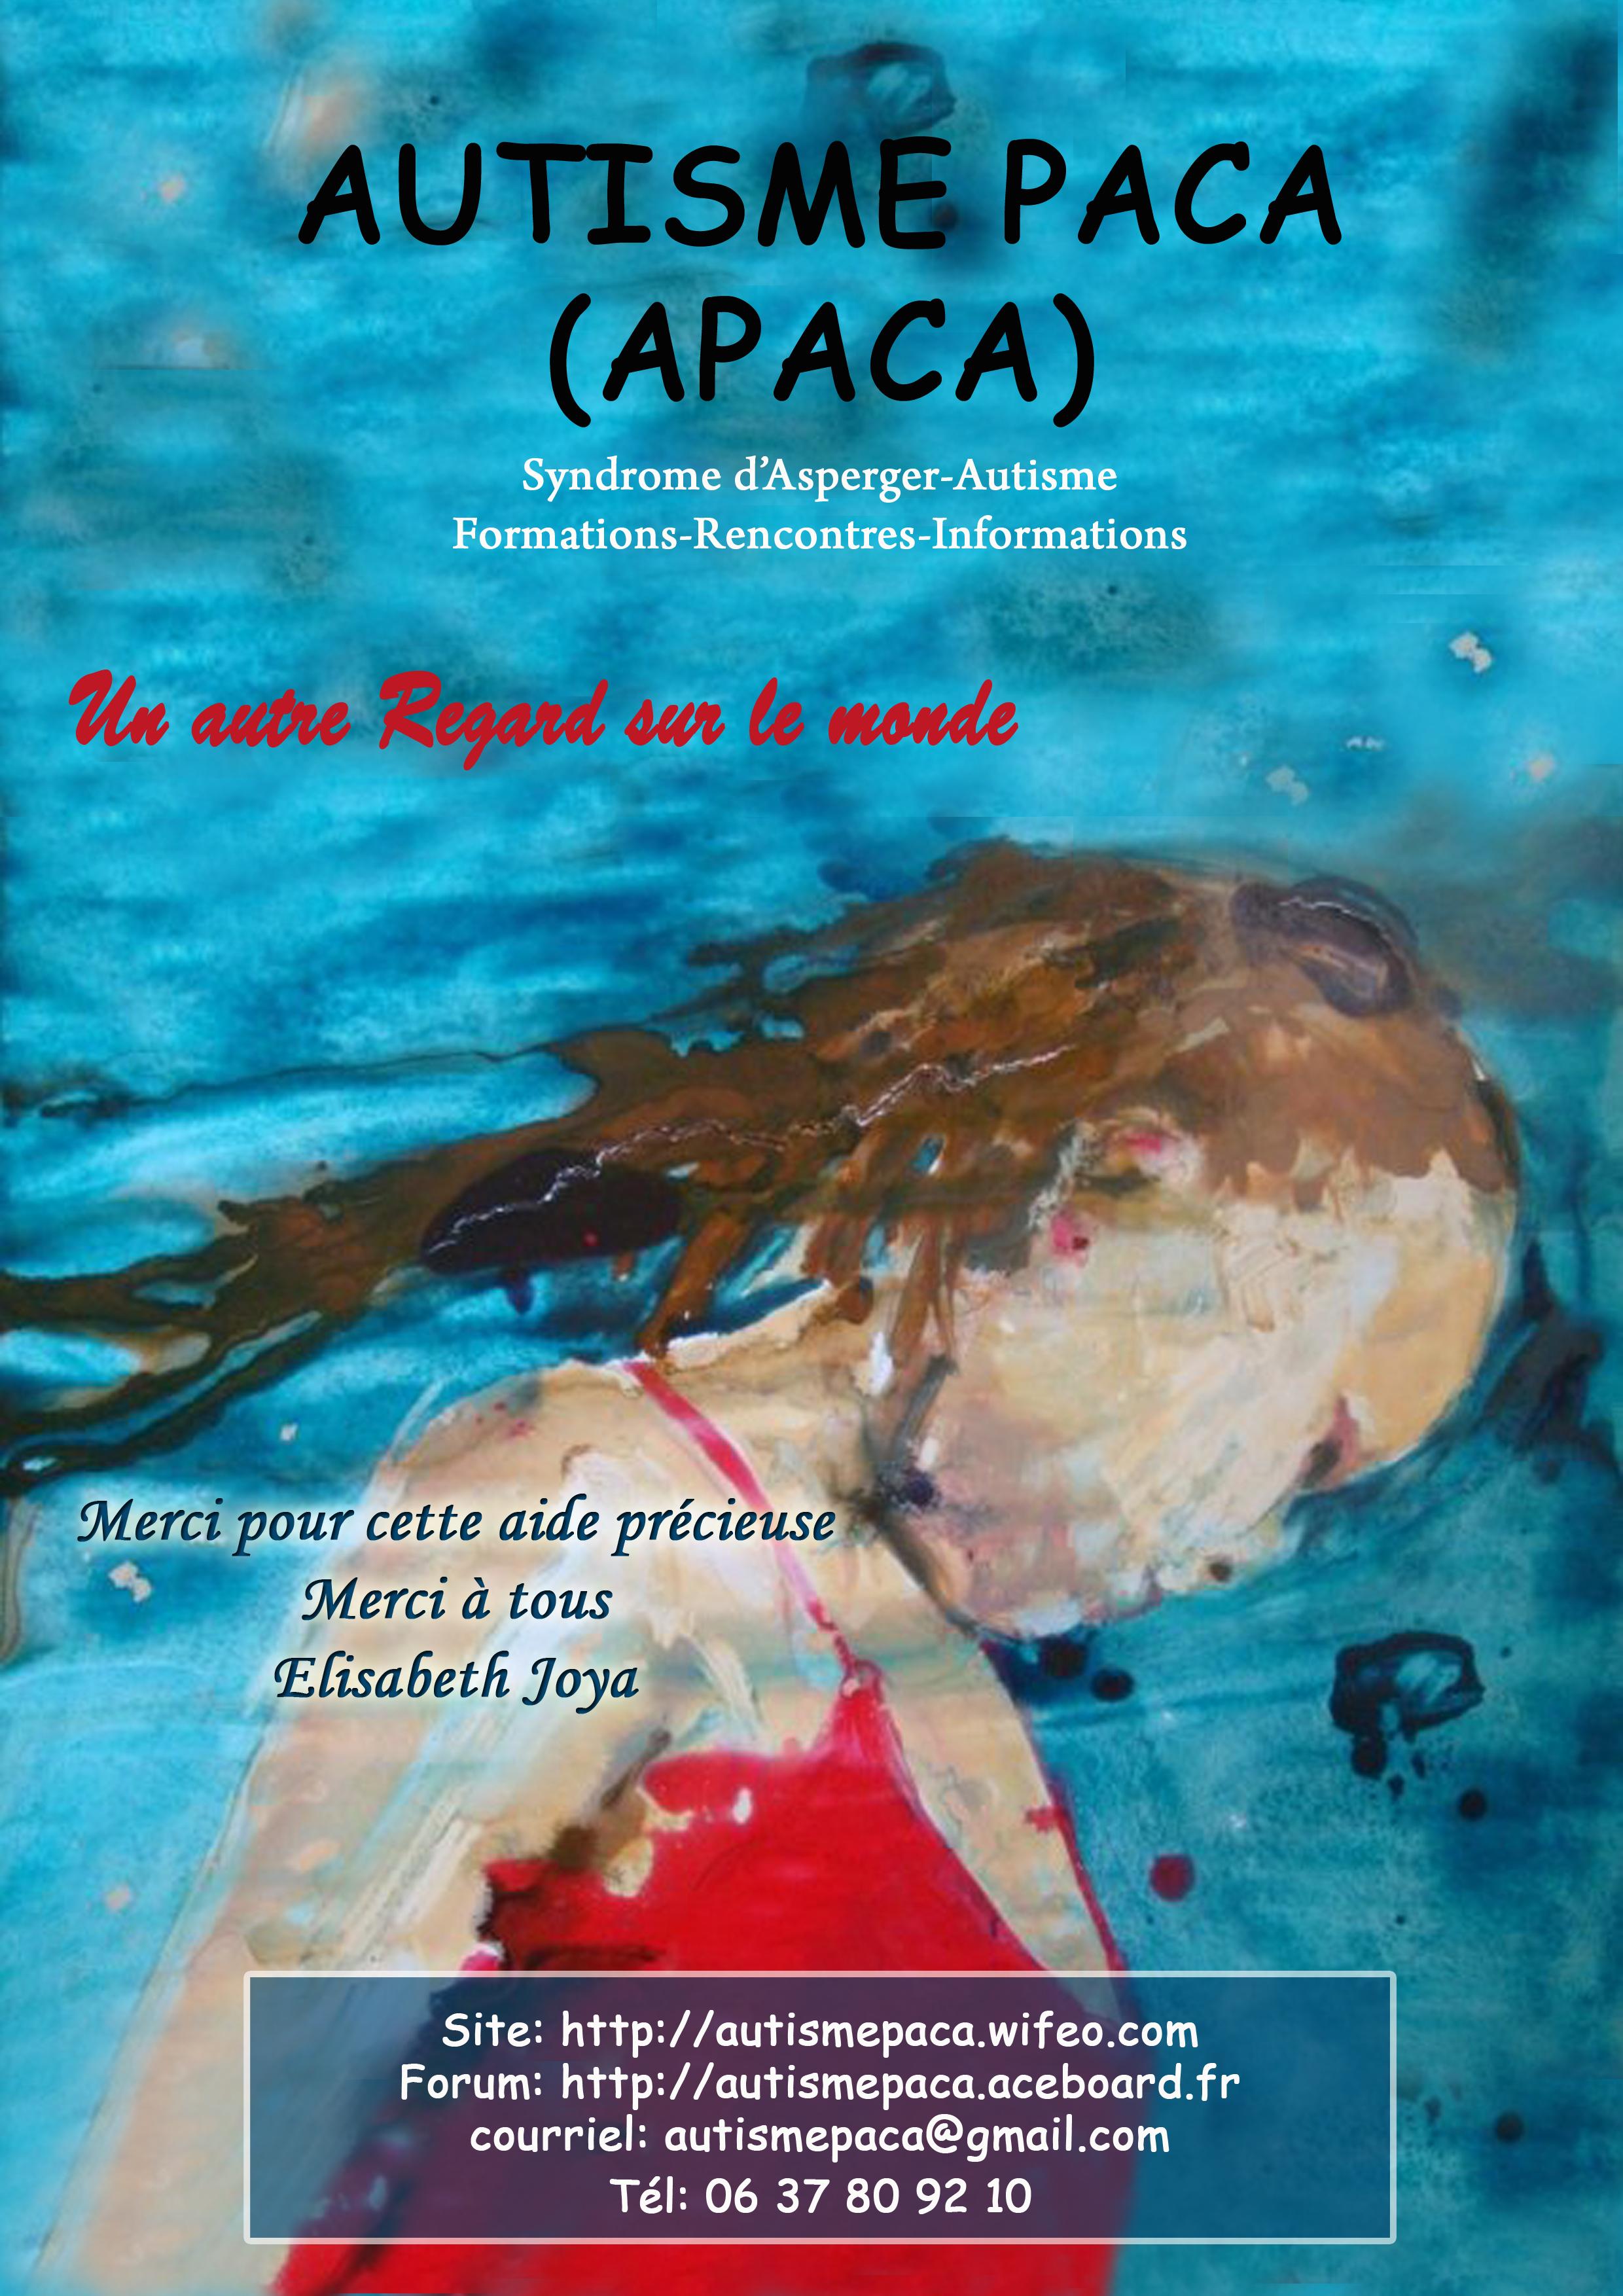 http://img52.xooimage.com/files/d/0/a/apaca-merci-de-elisabeth-2606199.jpg